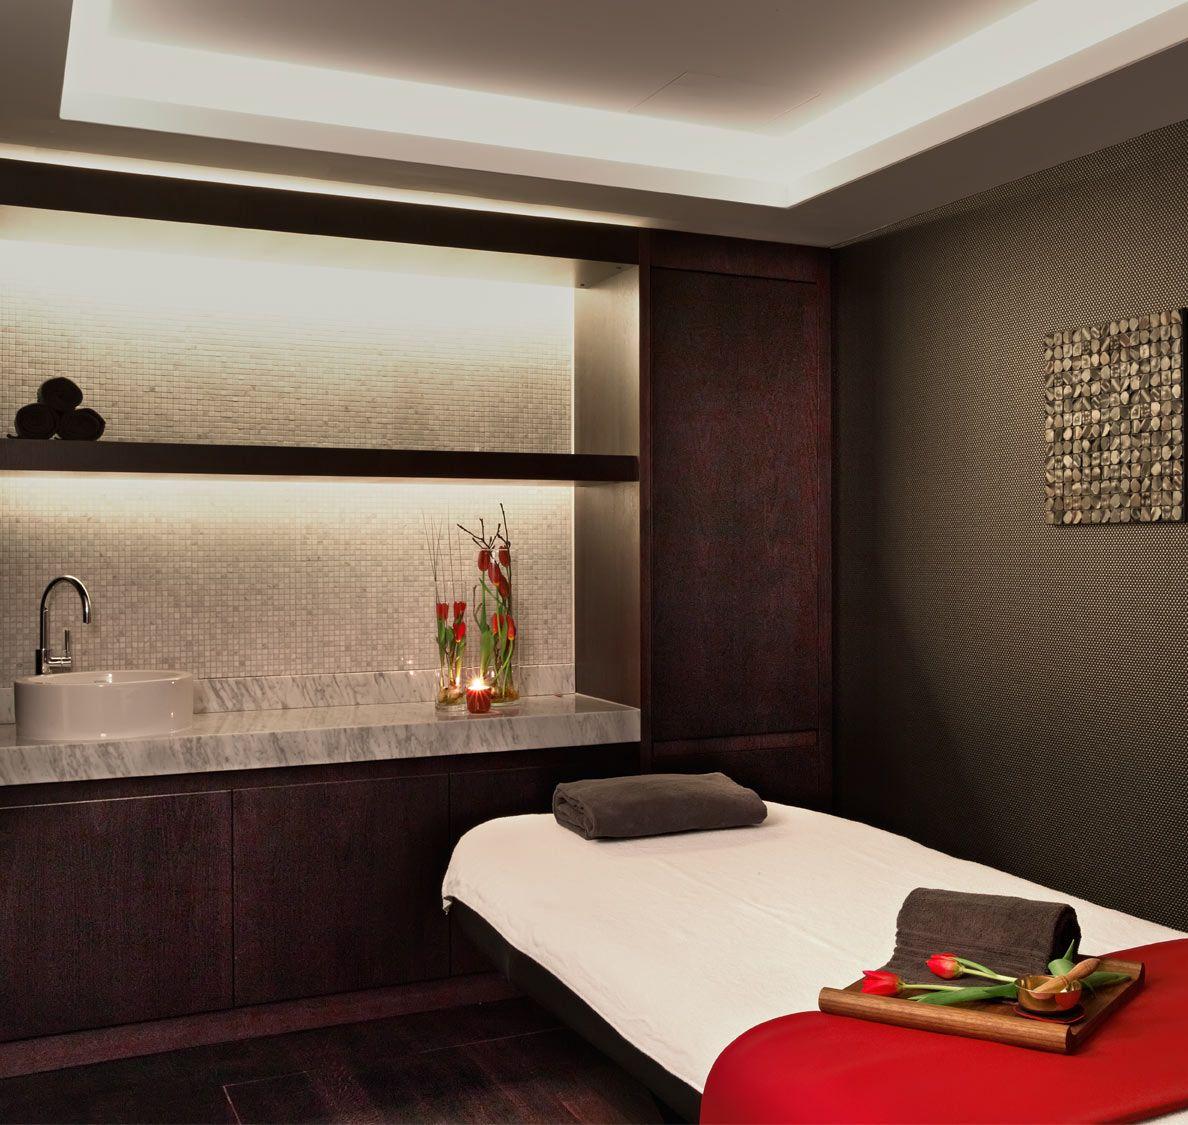 Spa treatments 1188 1125 spa design for Beauty treatment room decor ideas